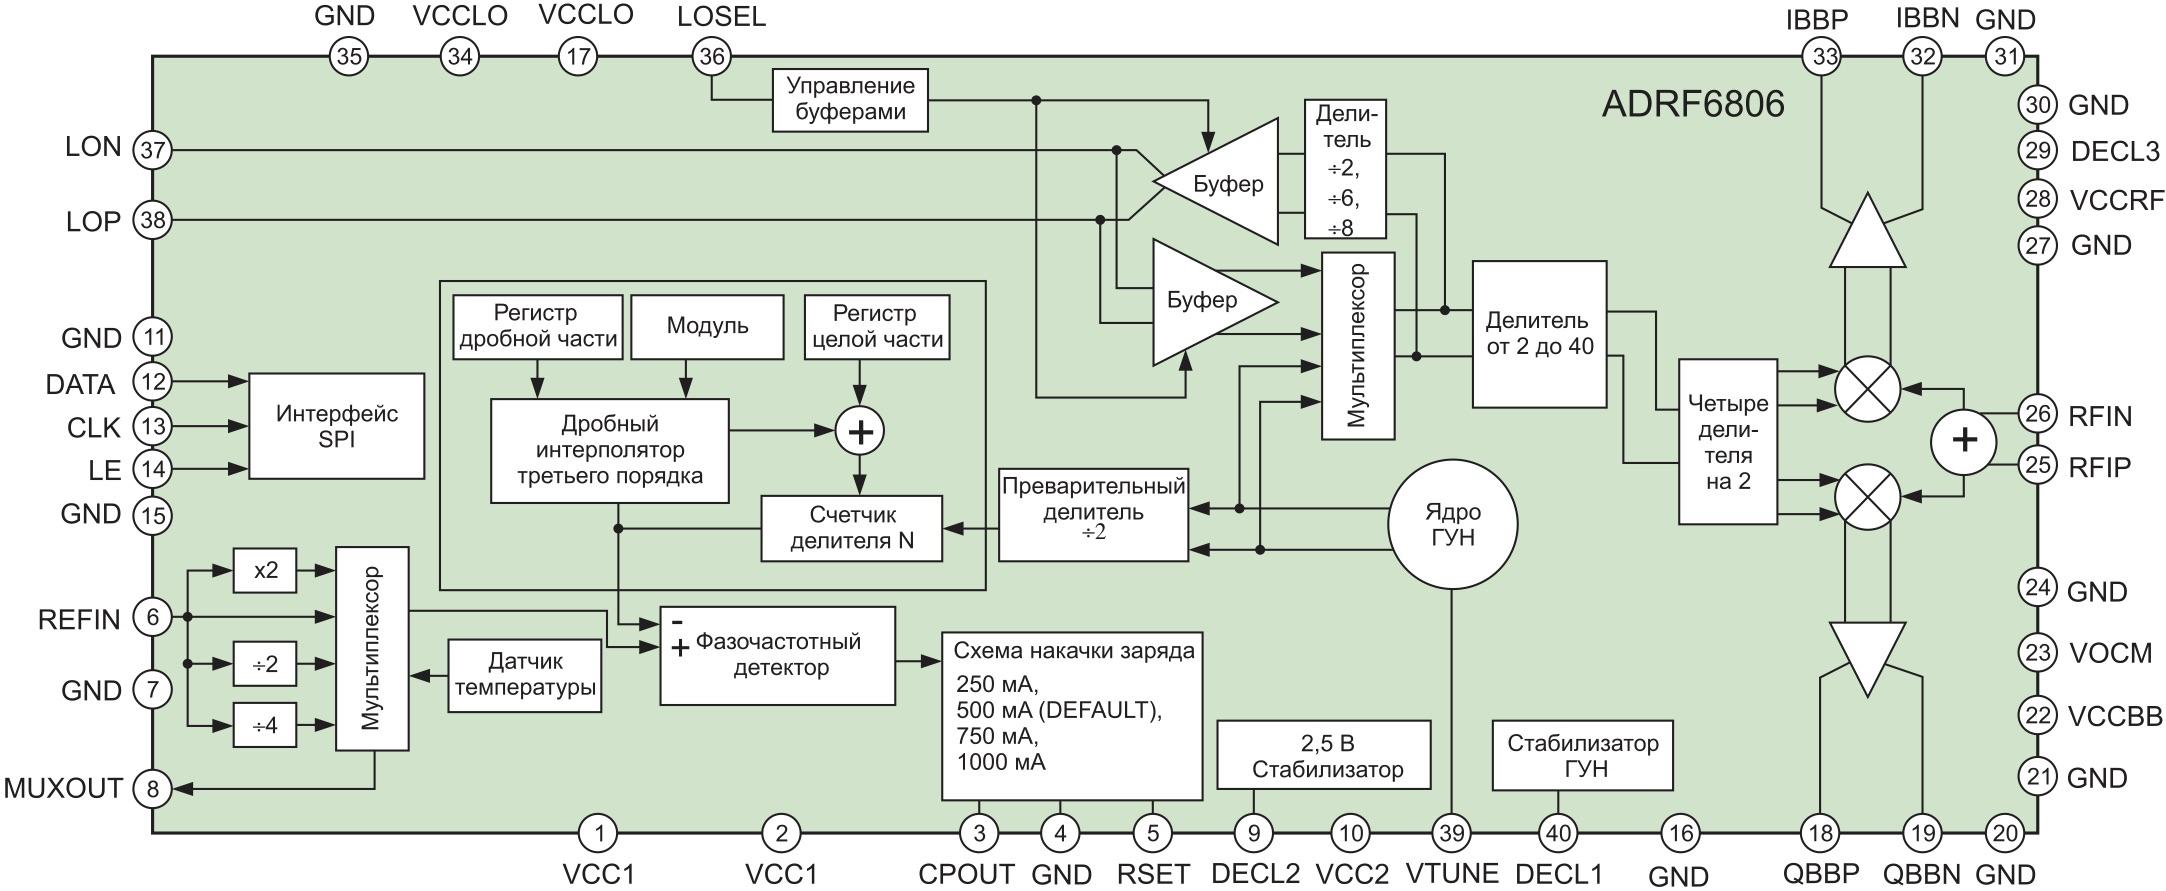 Структурная схема ADRF6806